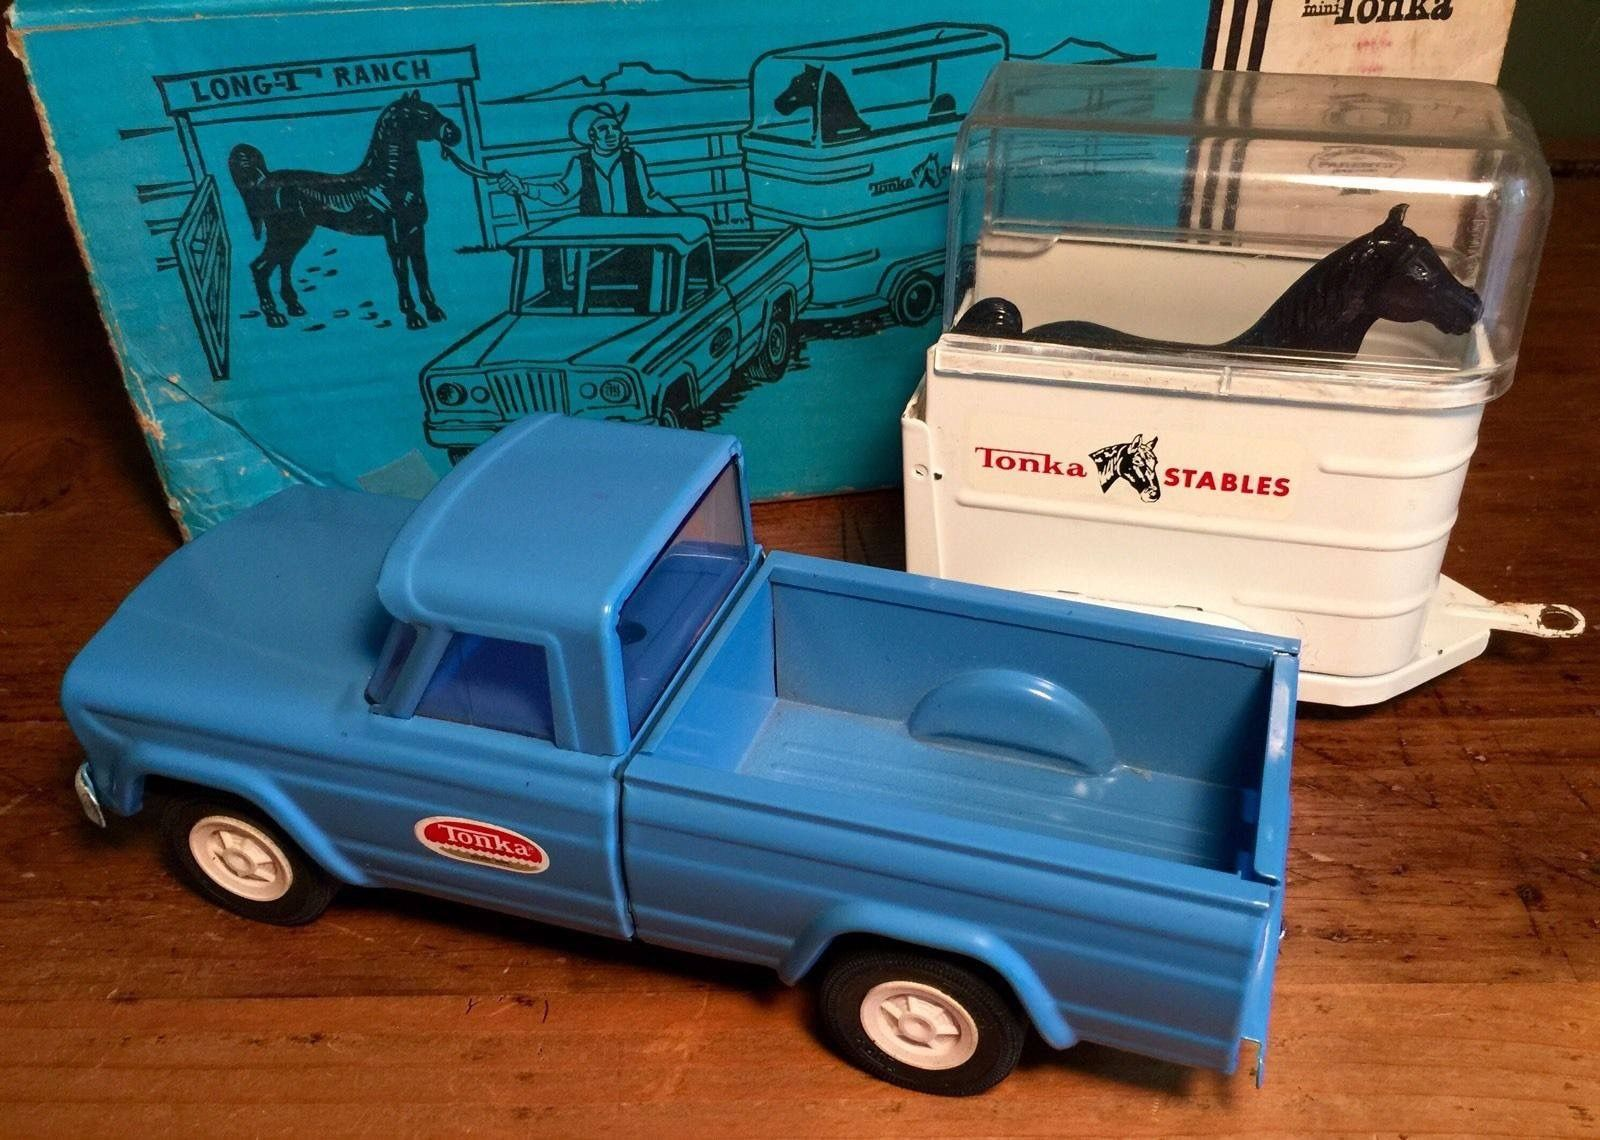 Jeep toys for kids  Pin by Cas Pieksma on Buddy L u Tonka truck toys  Pinterest  Jeeps